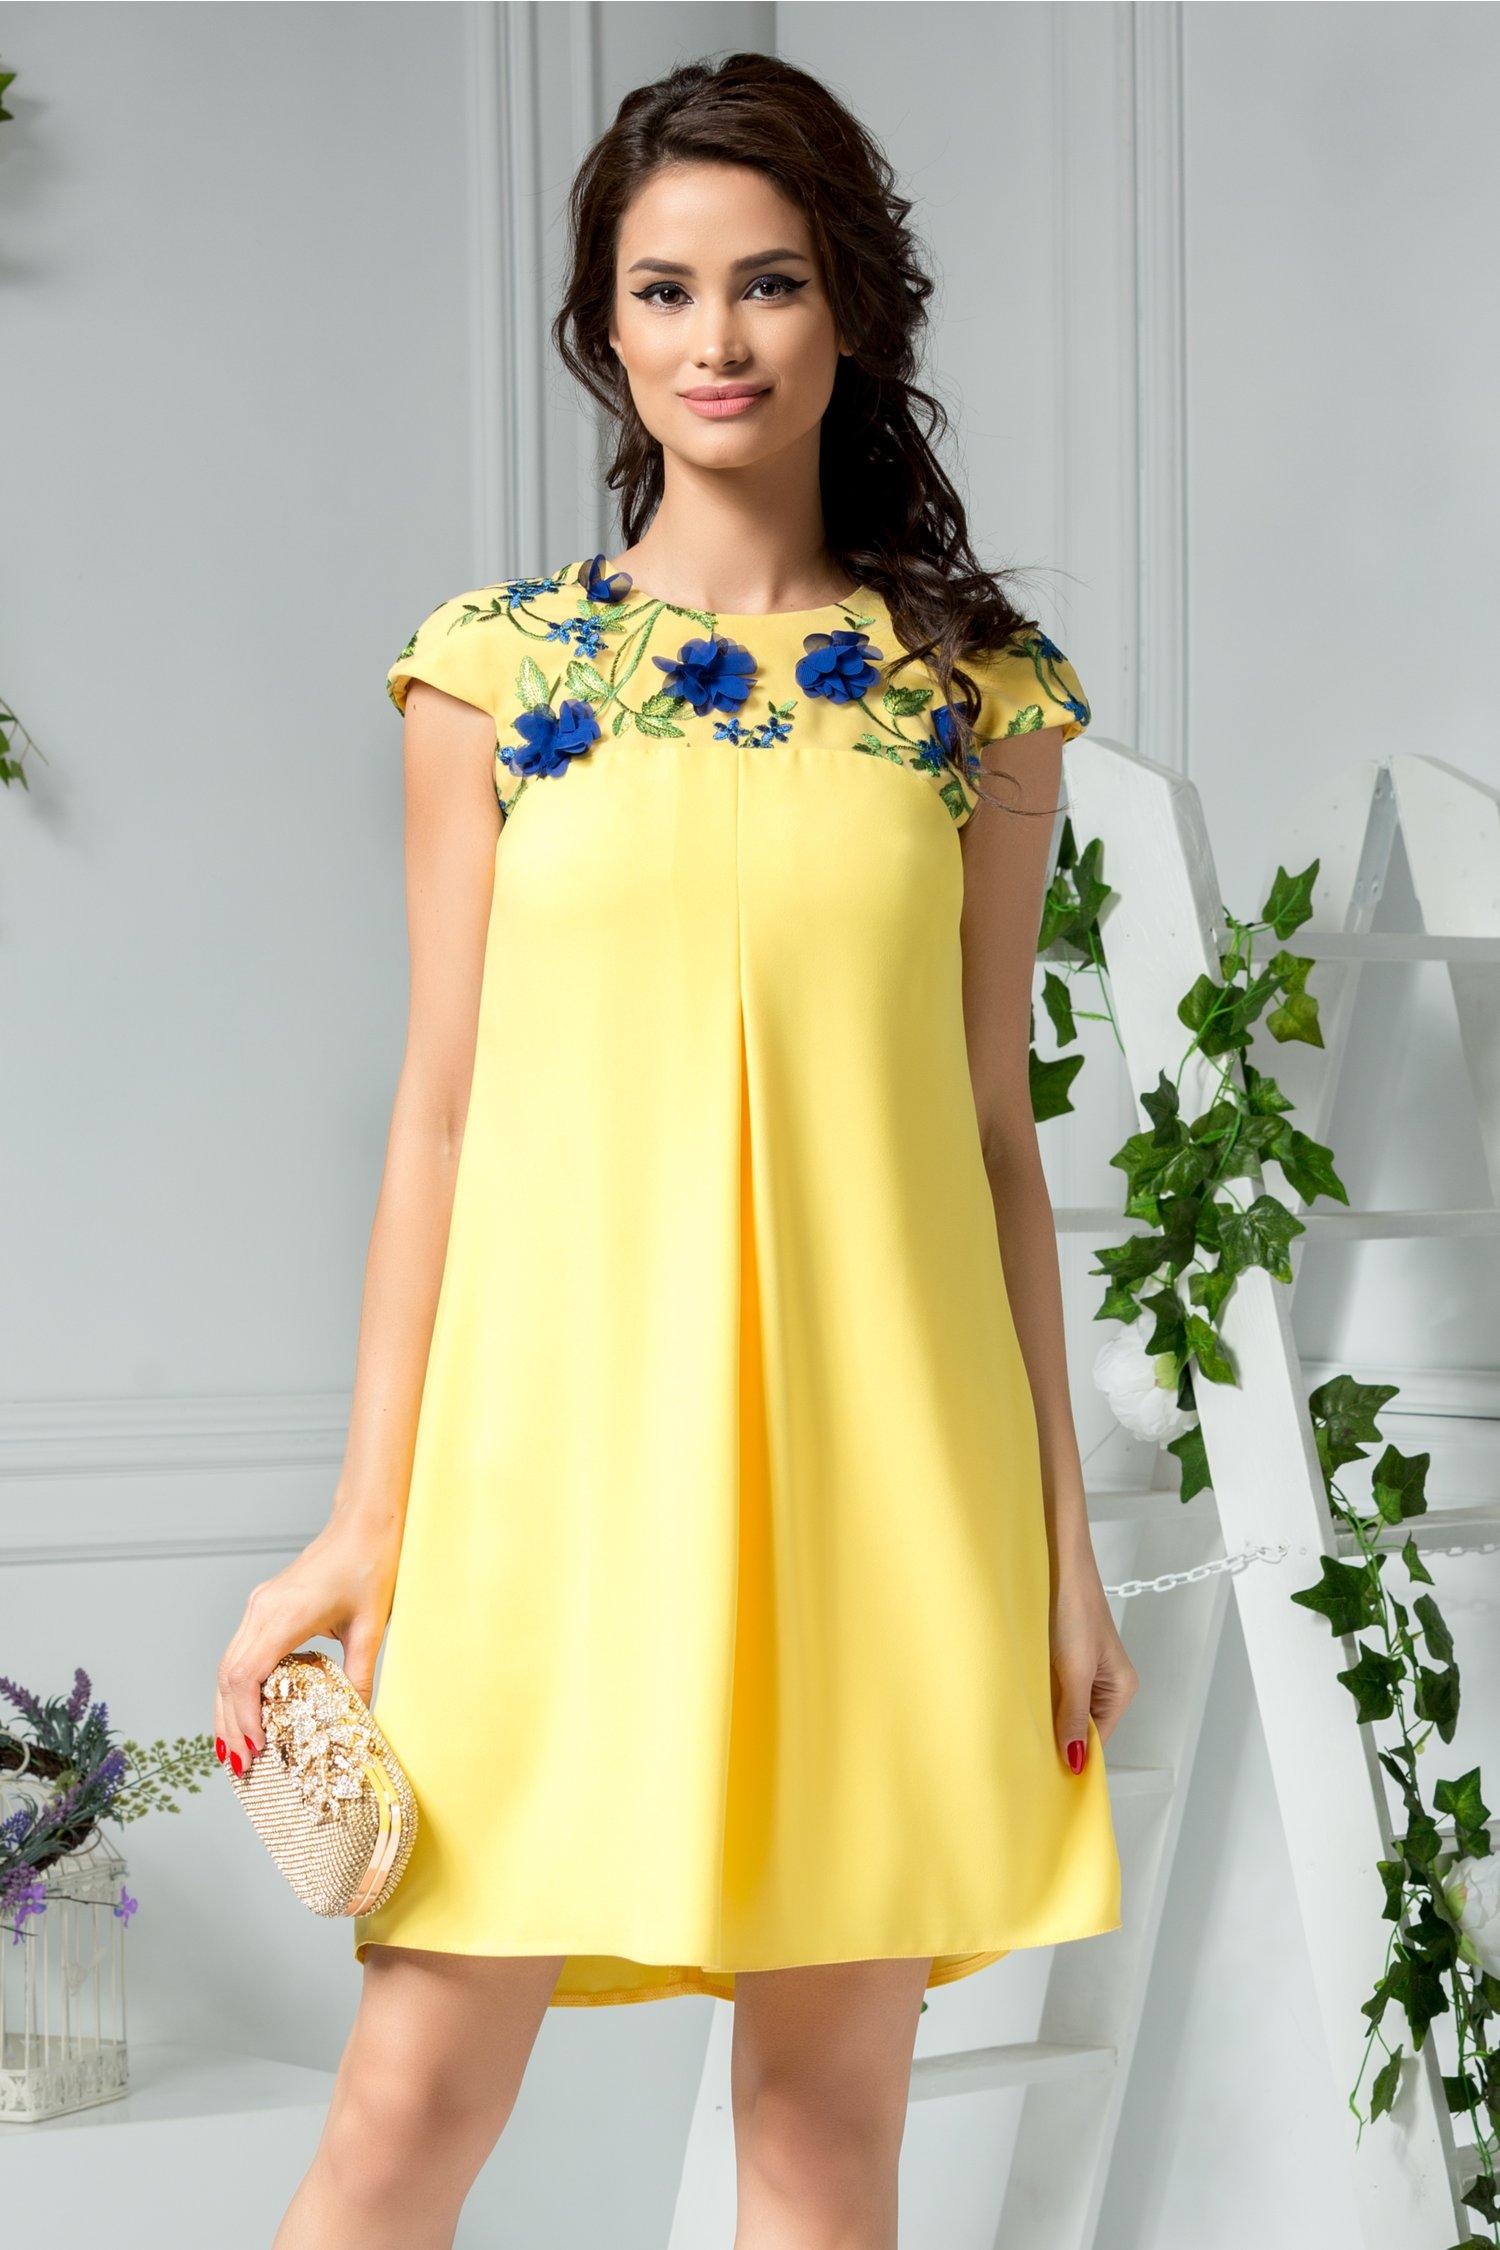 Rochie Moze galbena cu aplicatii florale albastre la bust